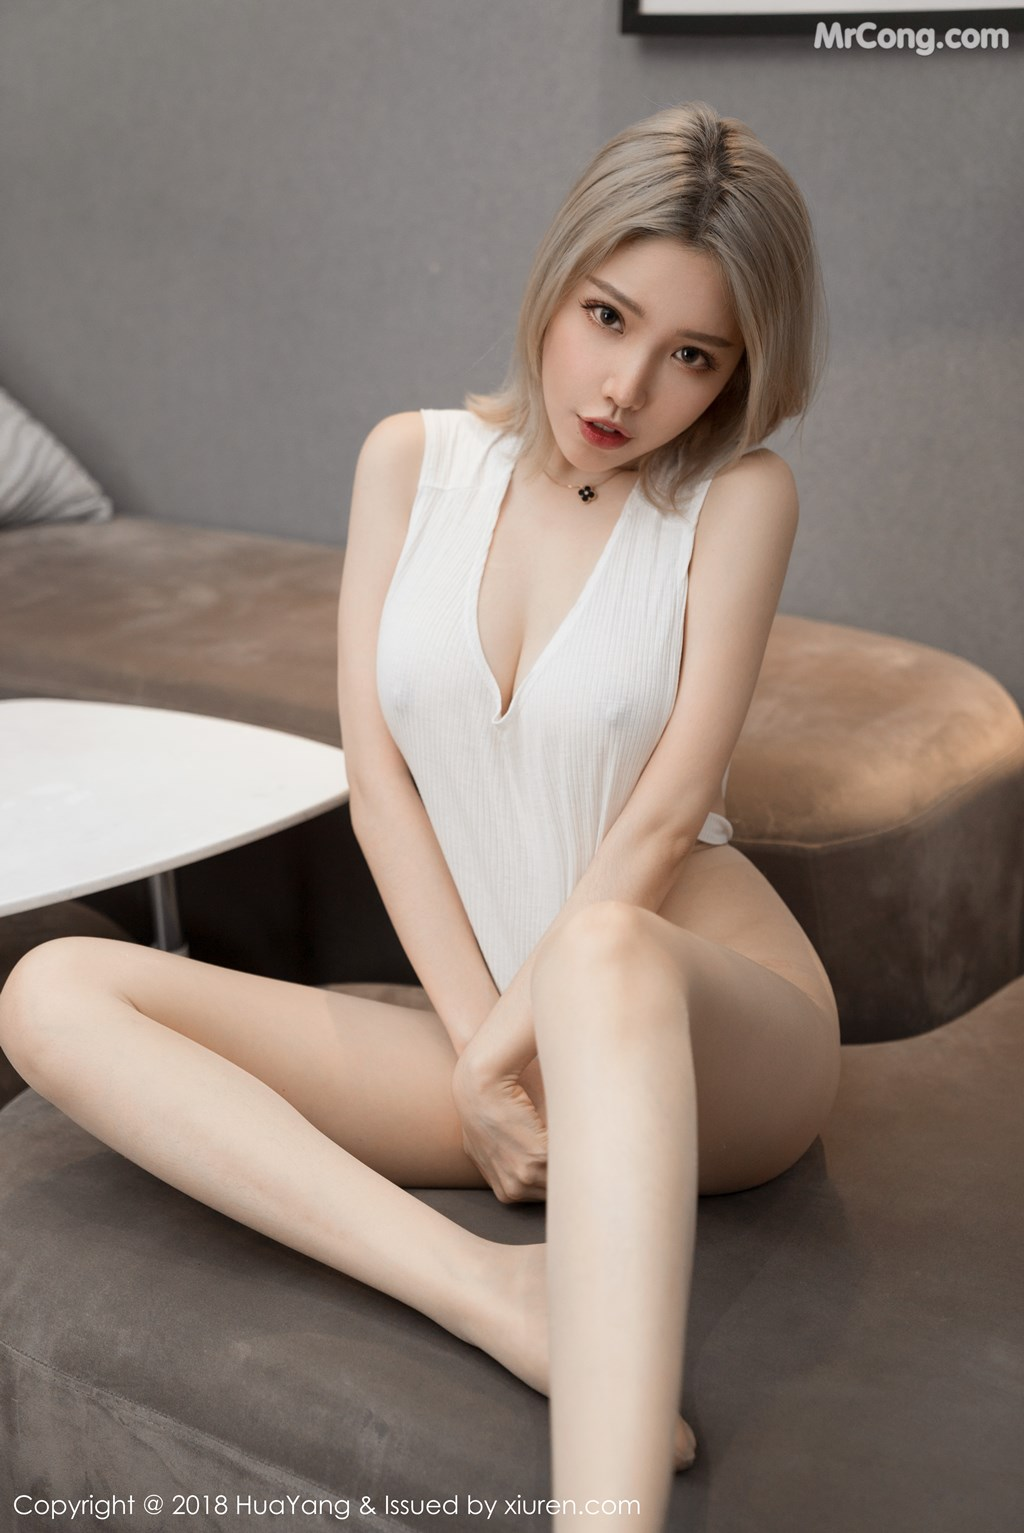 Image HuaYang-2018-01-02-Vol.022-Huang-Le-Ran-MrCong.com-010 in post HuaYang 2018-01-02 Vol.022: Người mẫu Huang Le Ran (黄楽然) (51 ảnh)